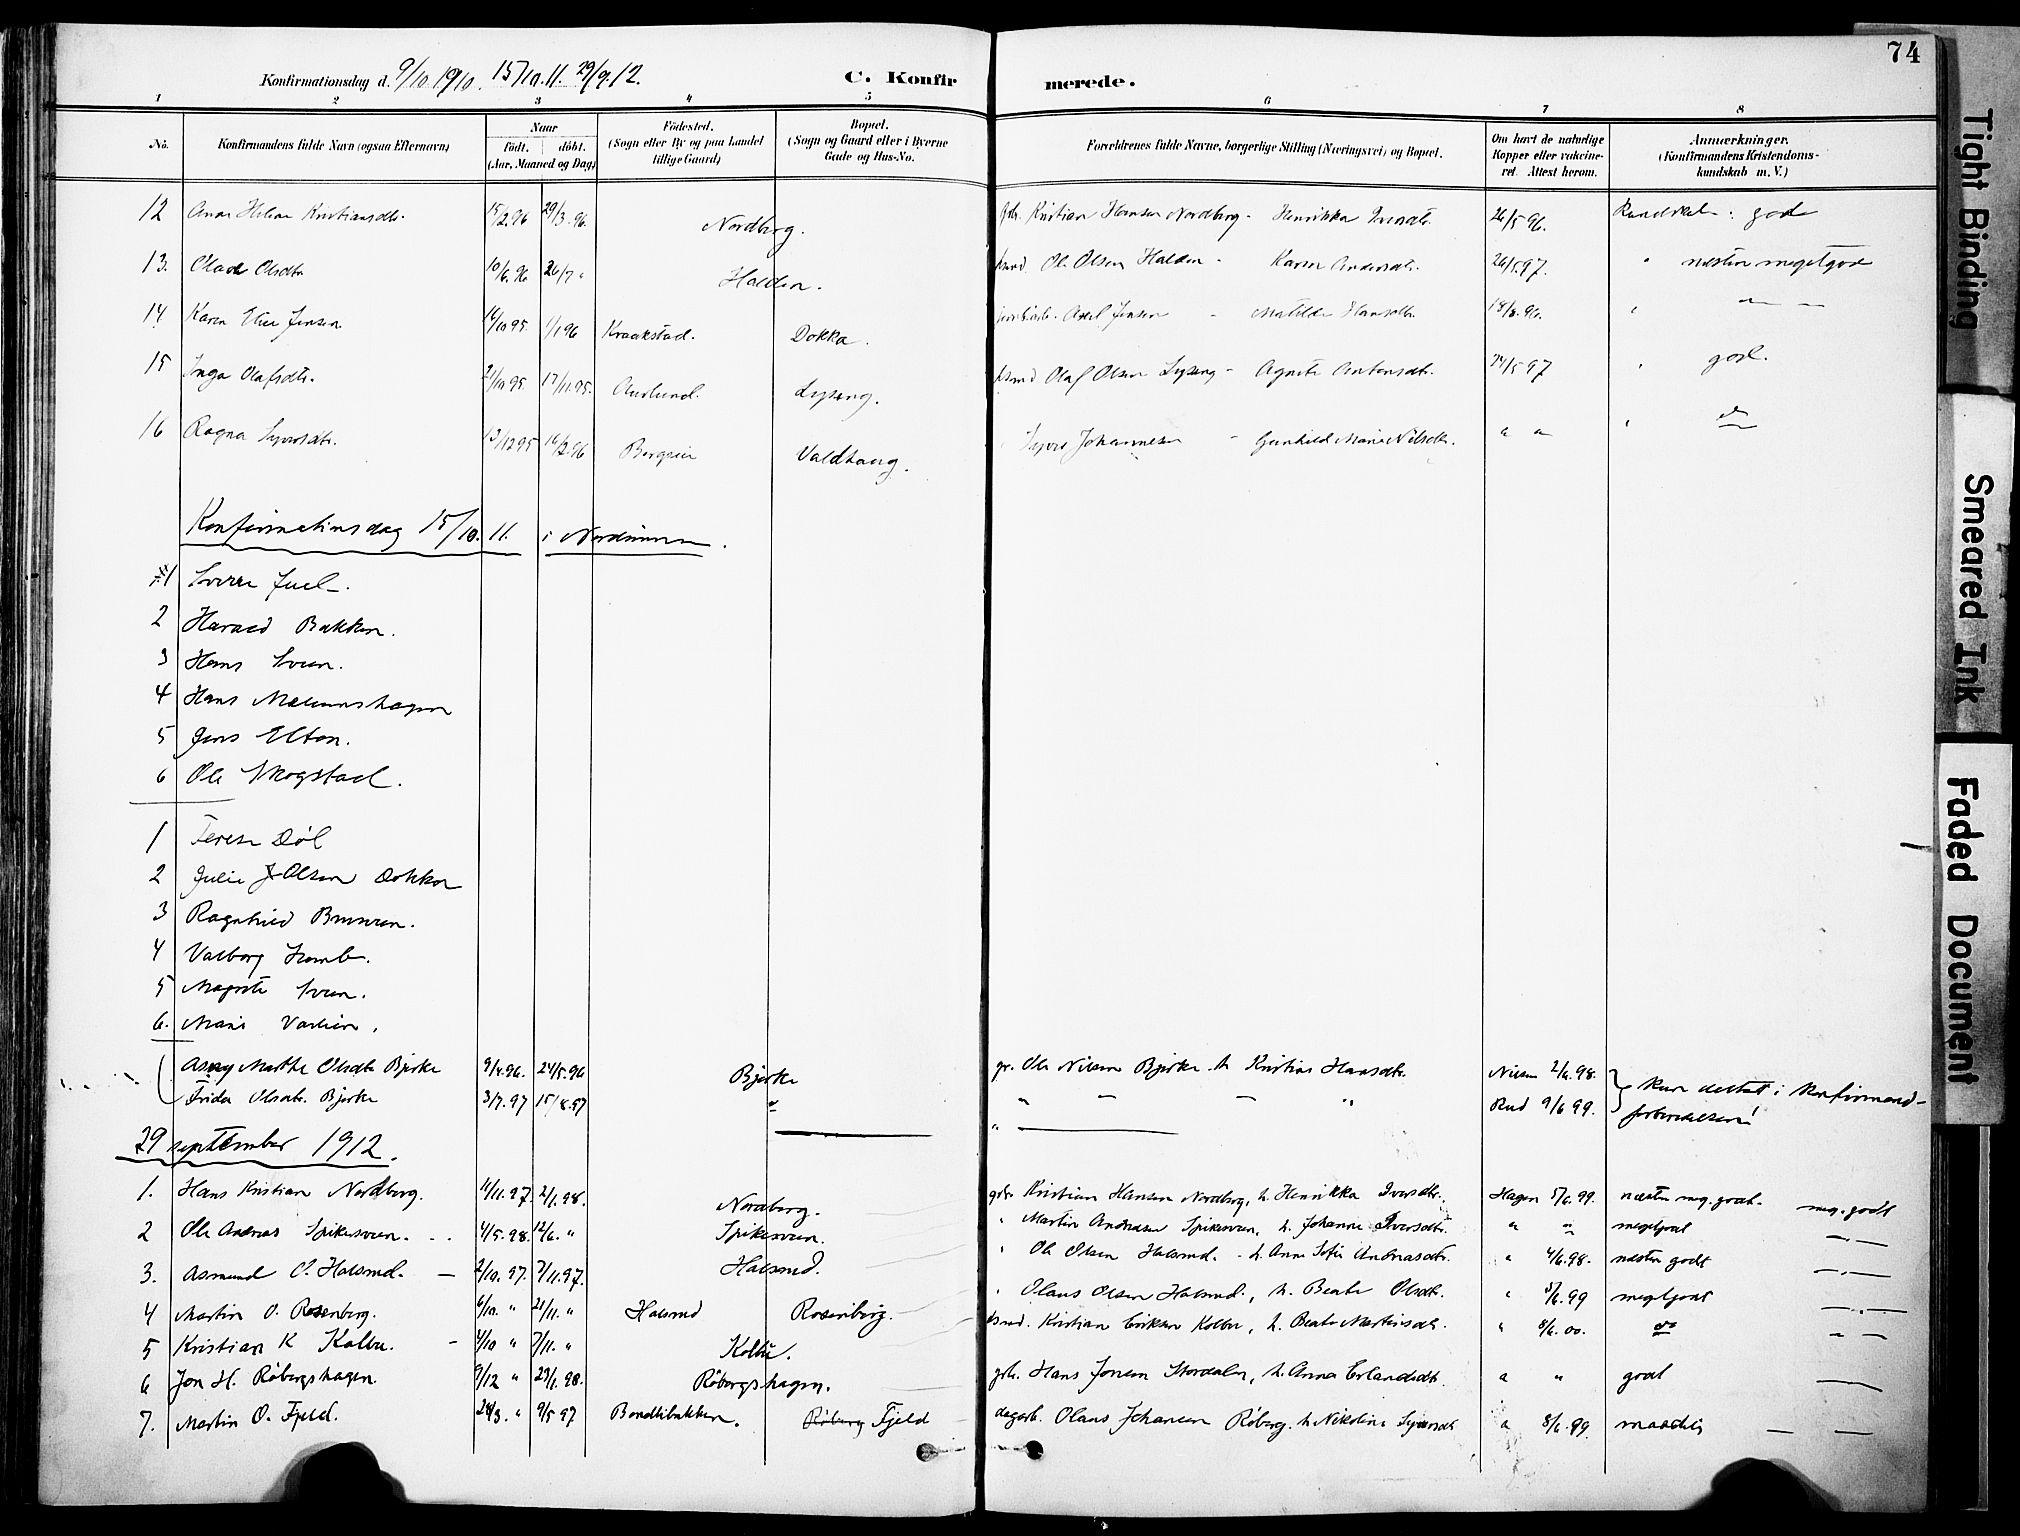 SAH, Nordre Land prestekontor, Ministerialbok nr. 6, 1897-1914, s. 74